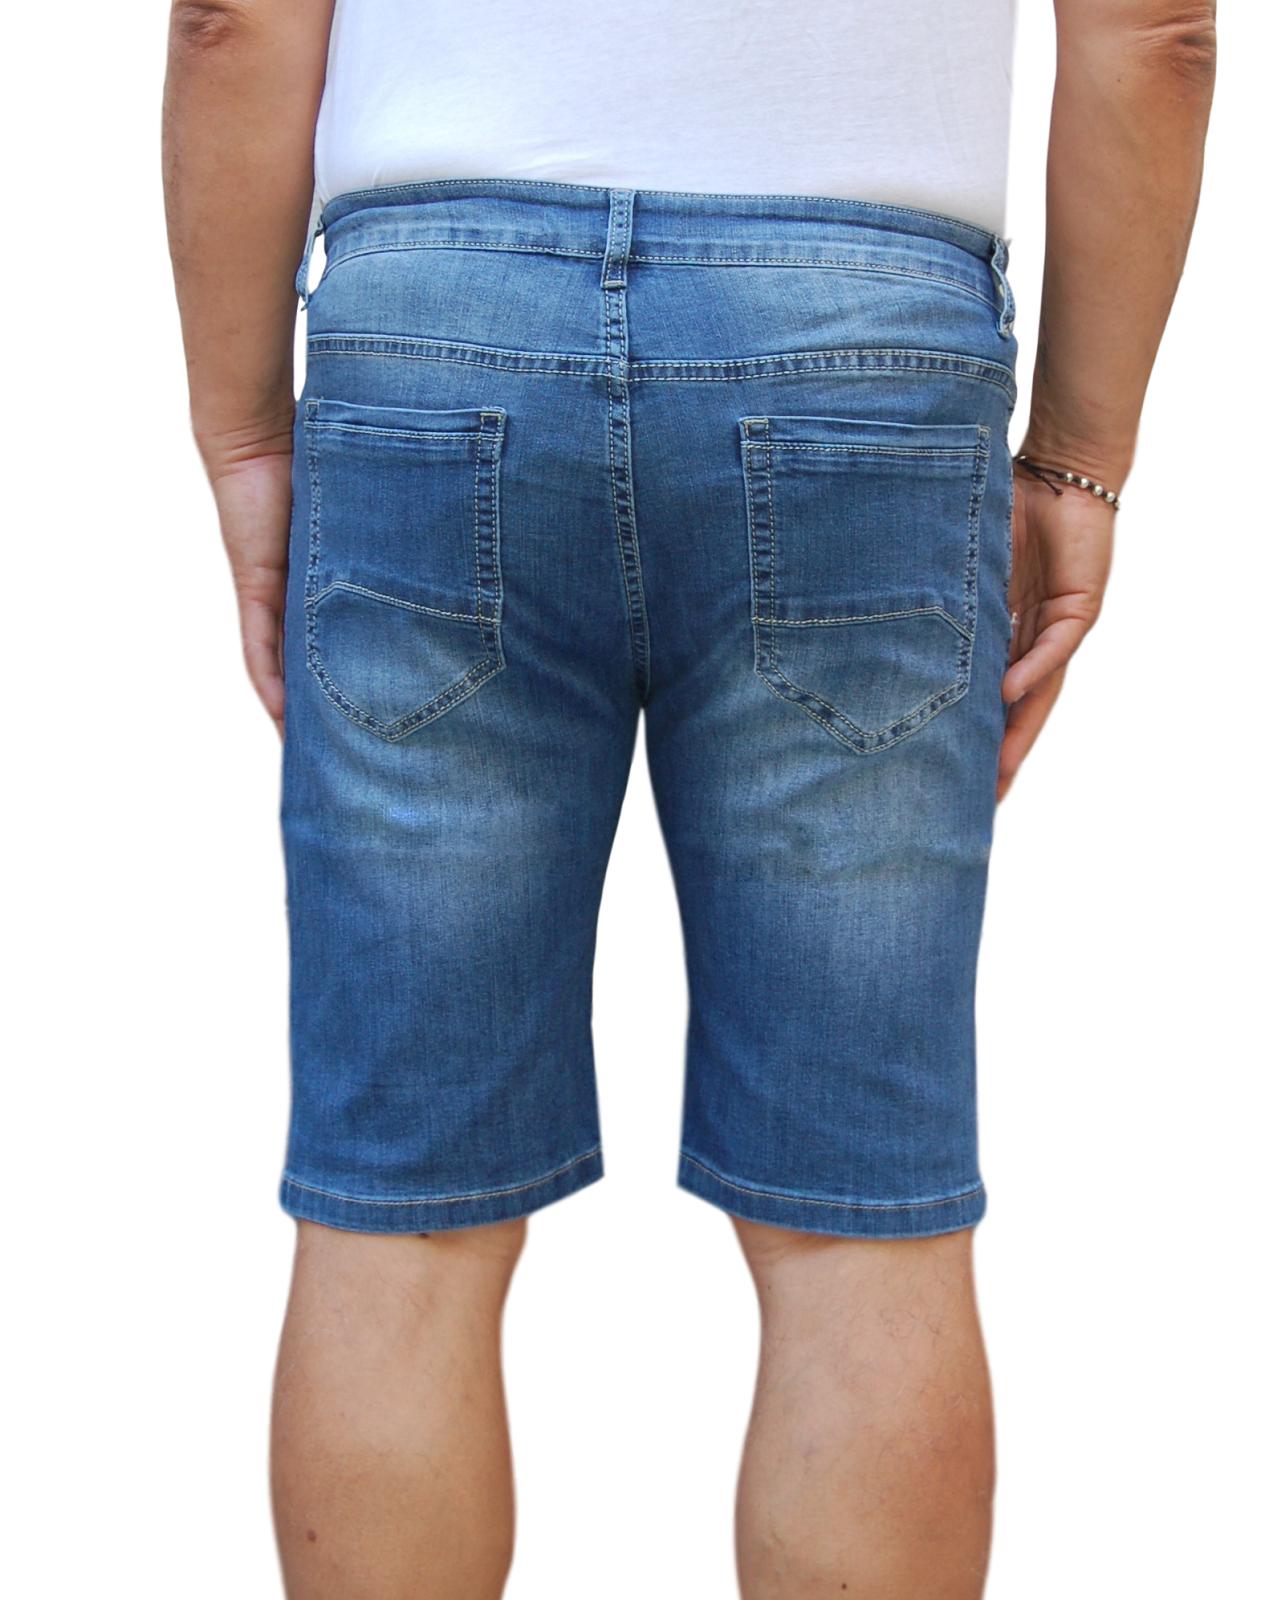 Bermuda-Uomo-Jeans-Denim-Corto-Tasche-America-Pantaloncino-Blu-Shorts-Casual-t miniatura 19